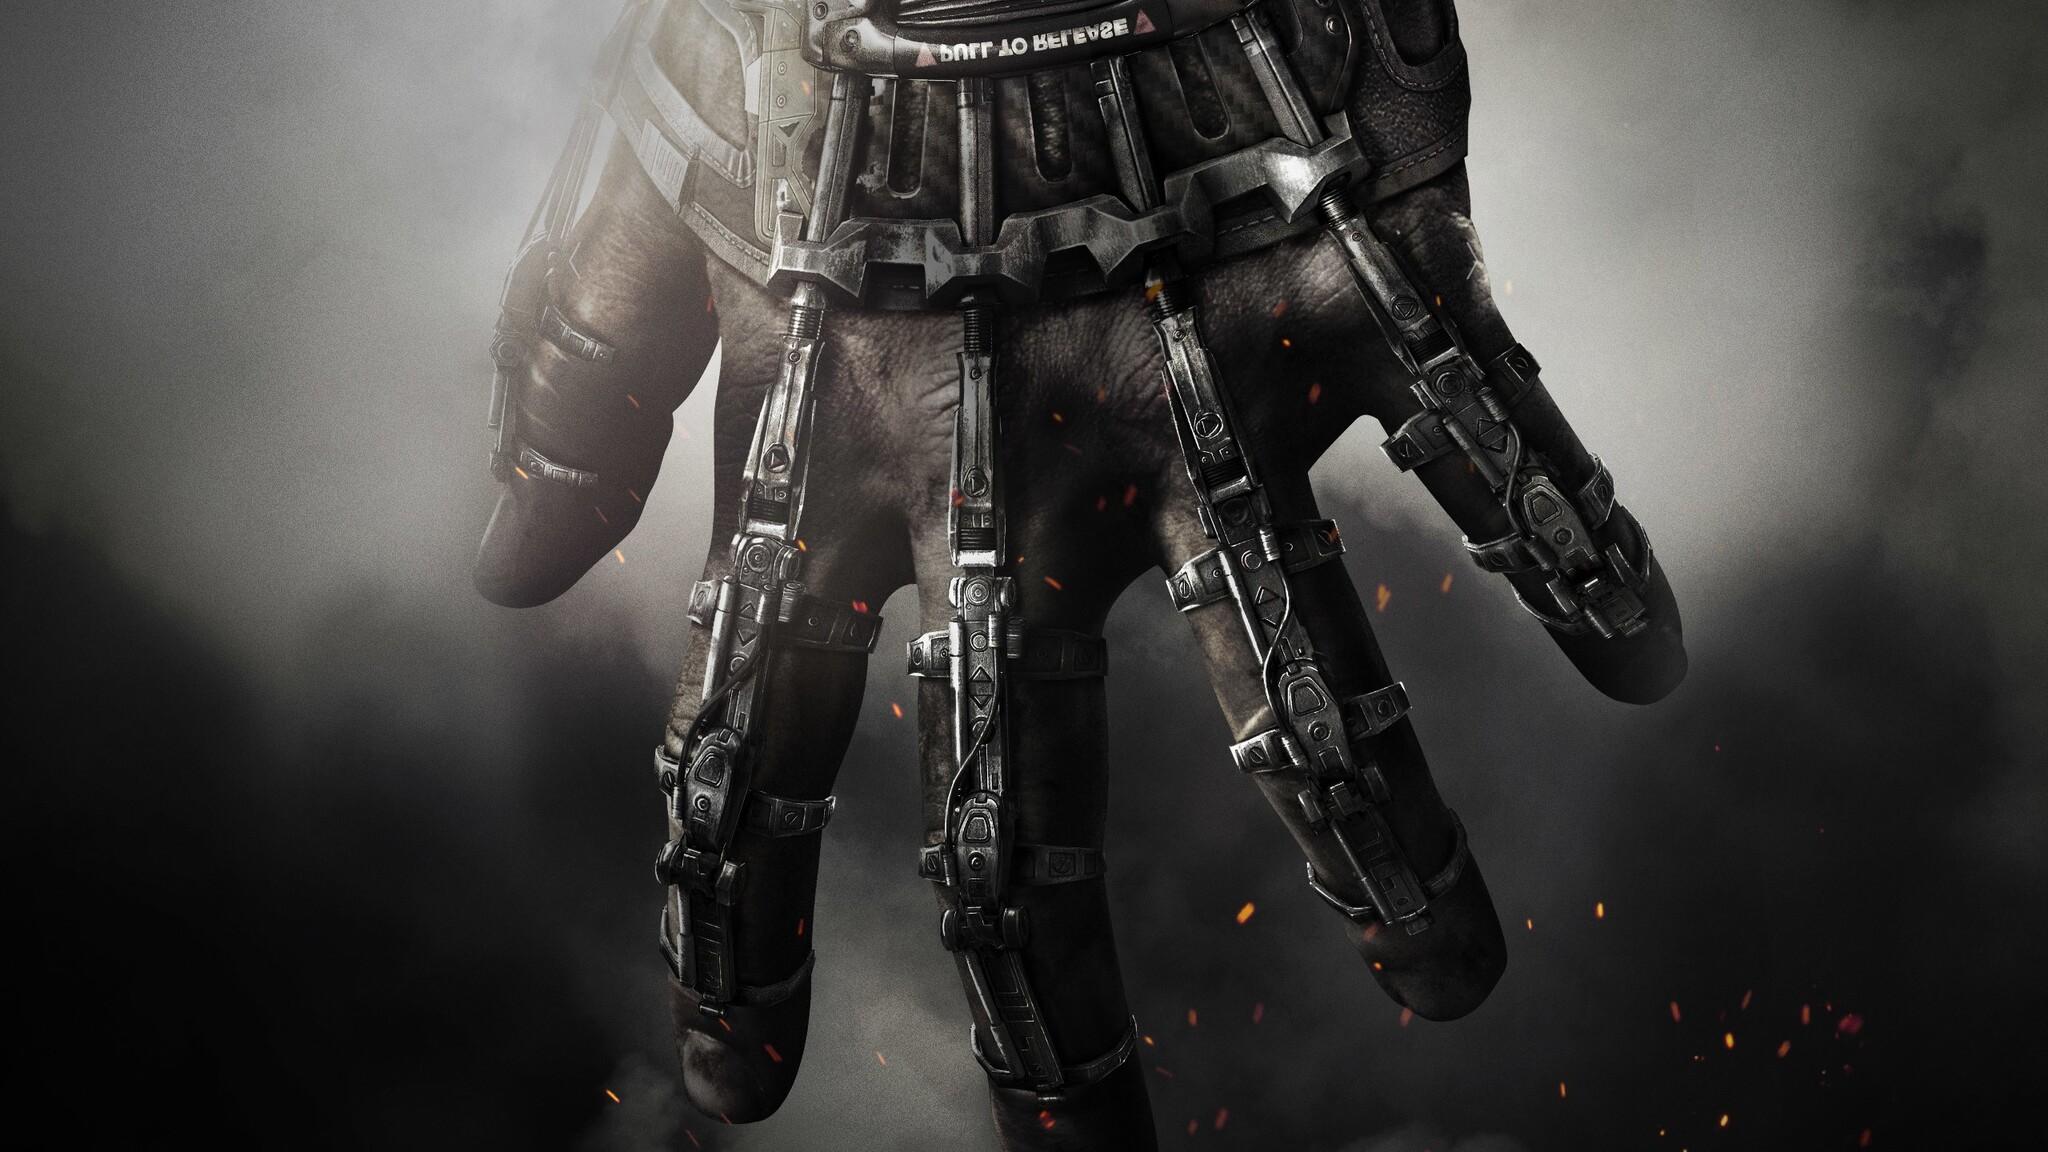 Call Of Duty Advanced Warfare Wallpapers: 2048x1152 Call Of Duty Advanced Warfare 3 2048x1152